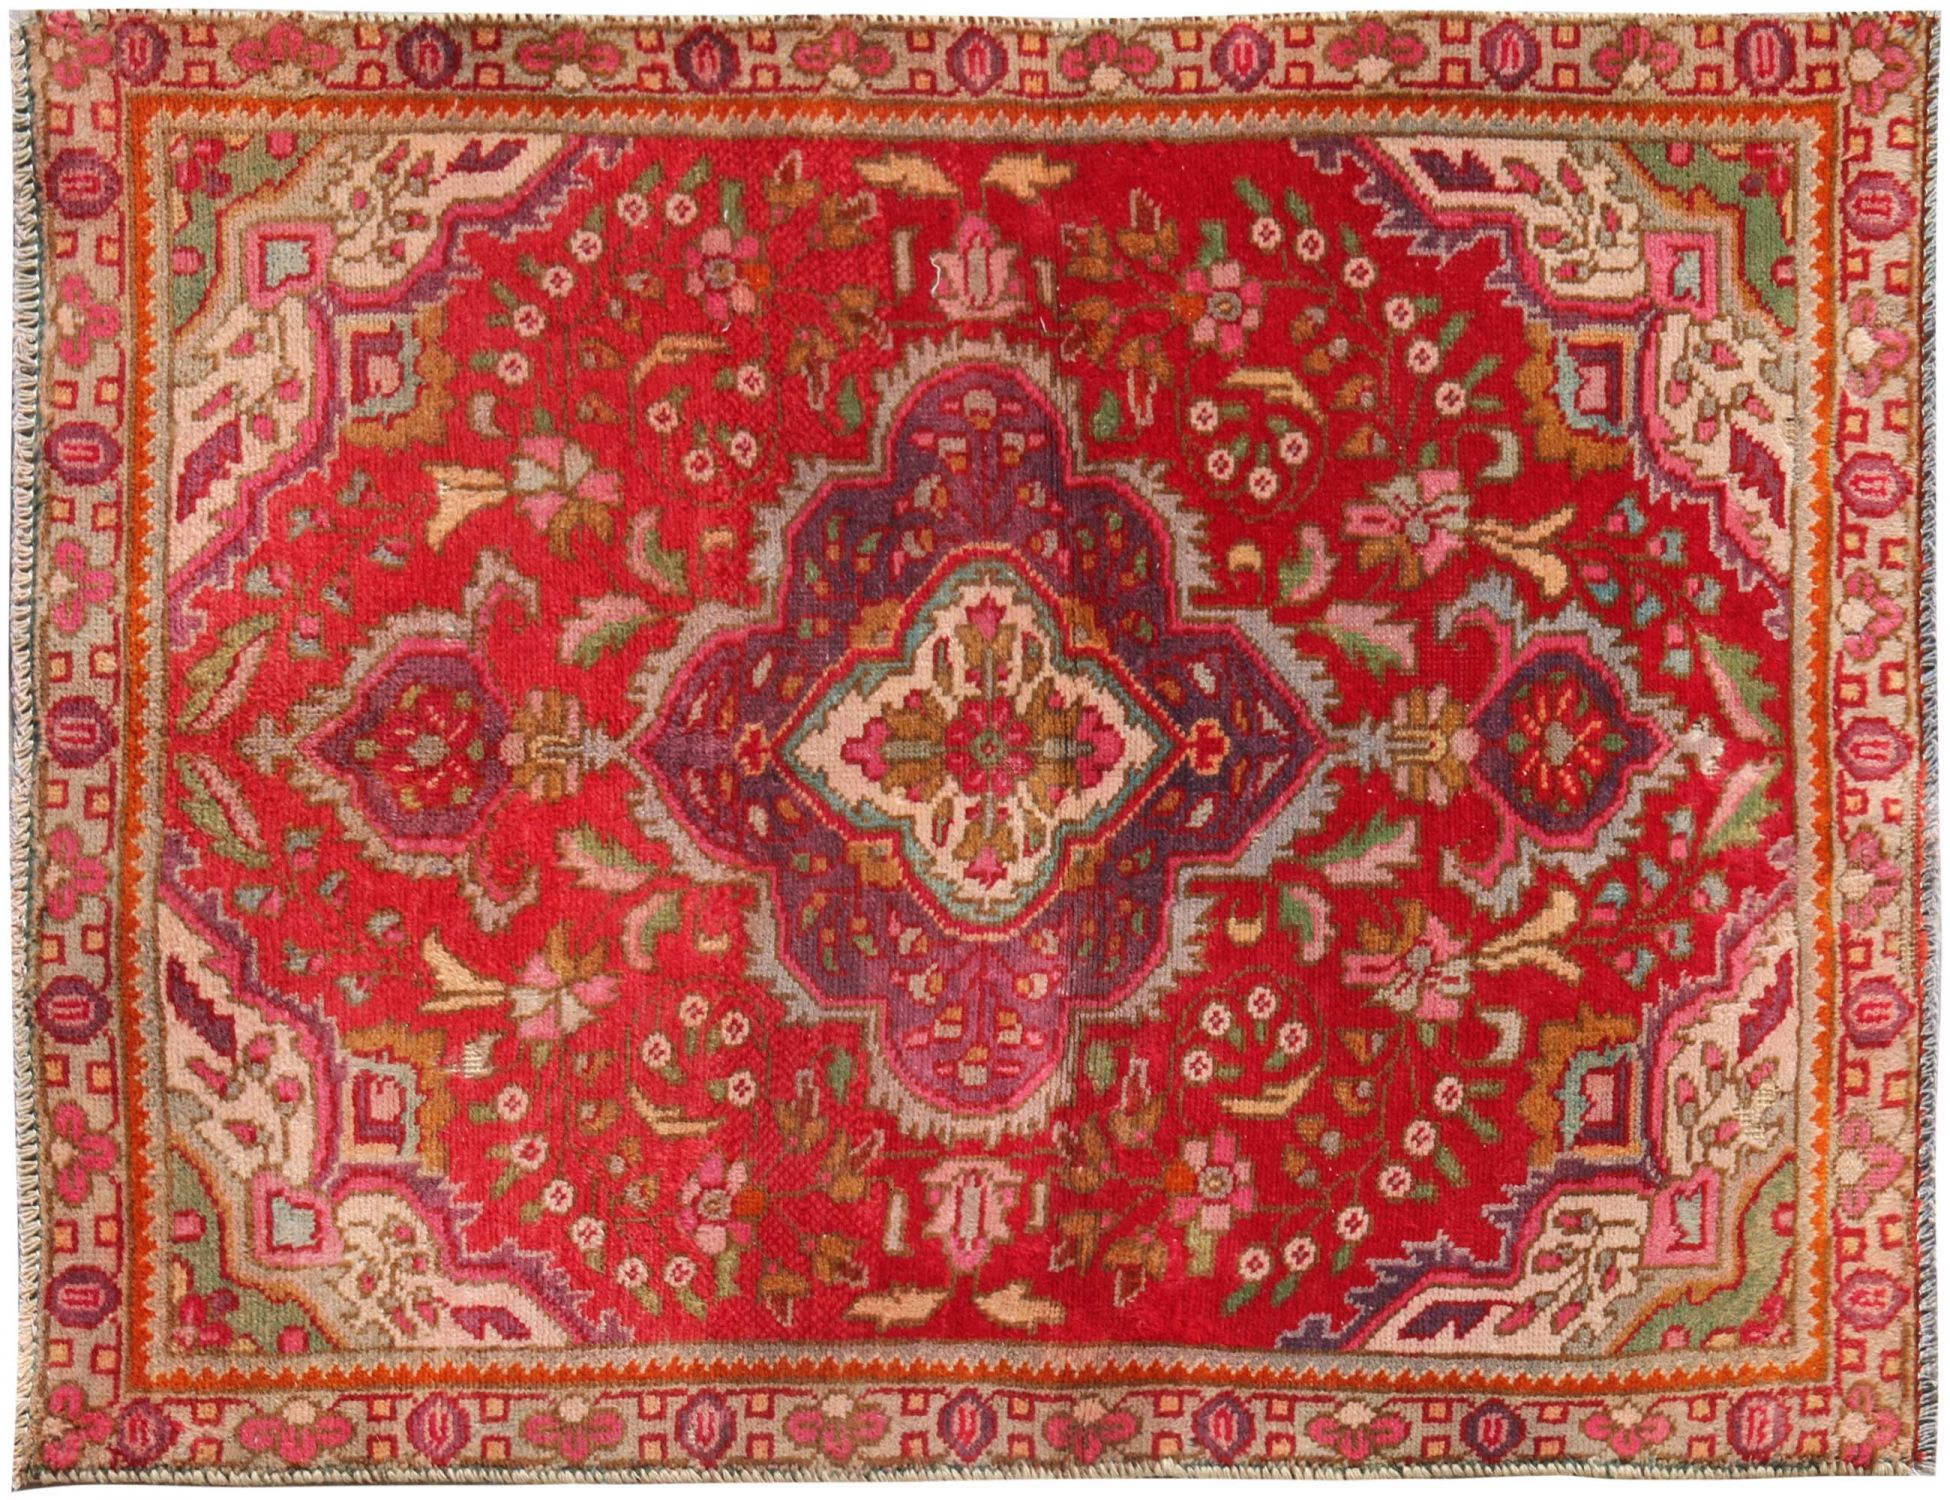 Retro Perserteppich  rot <br/>137 x 90 cm